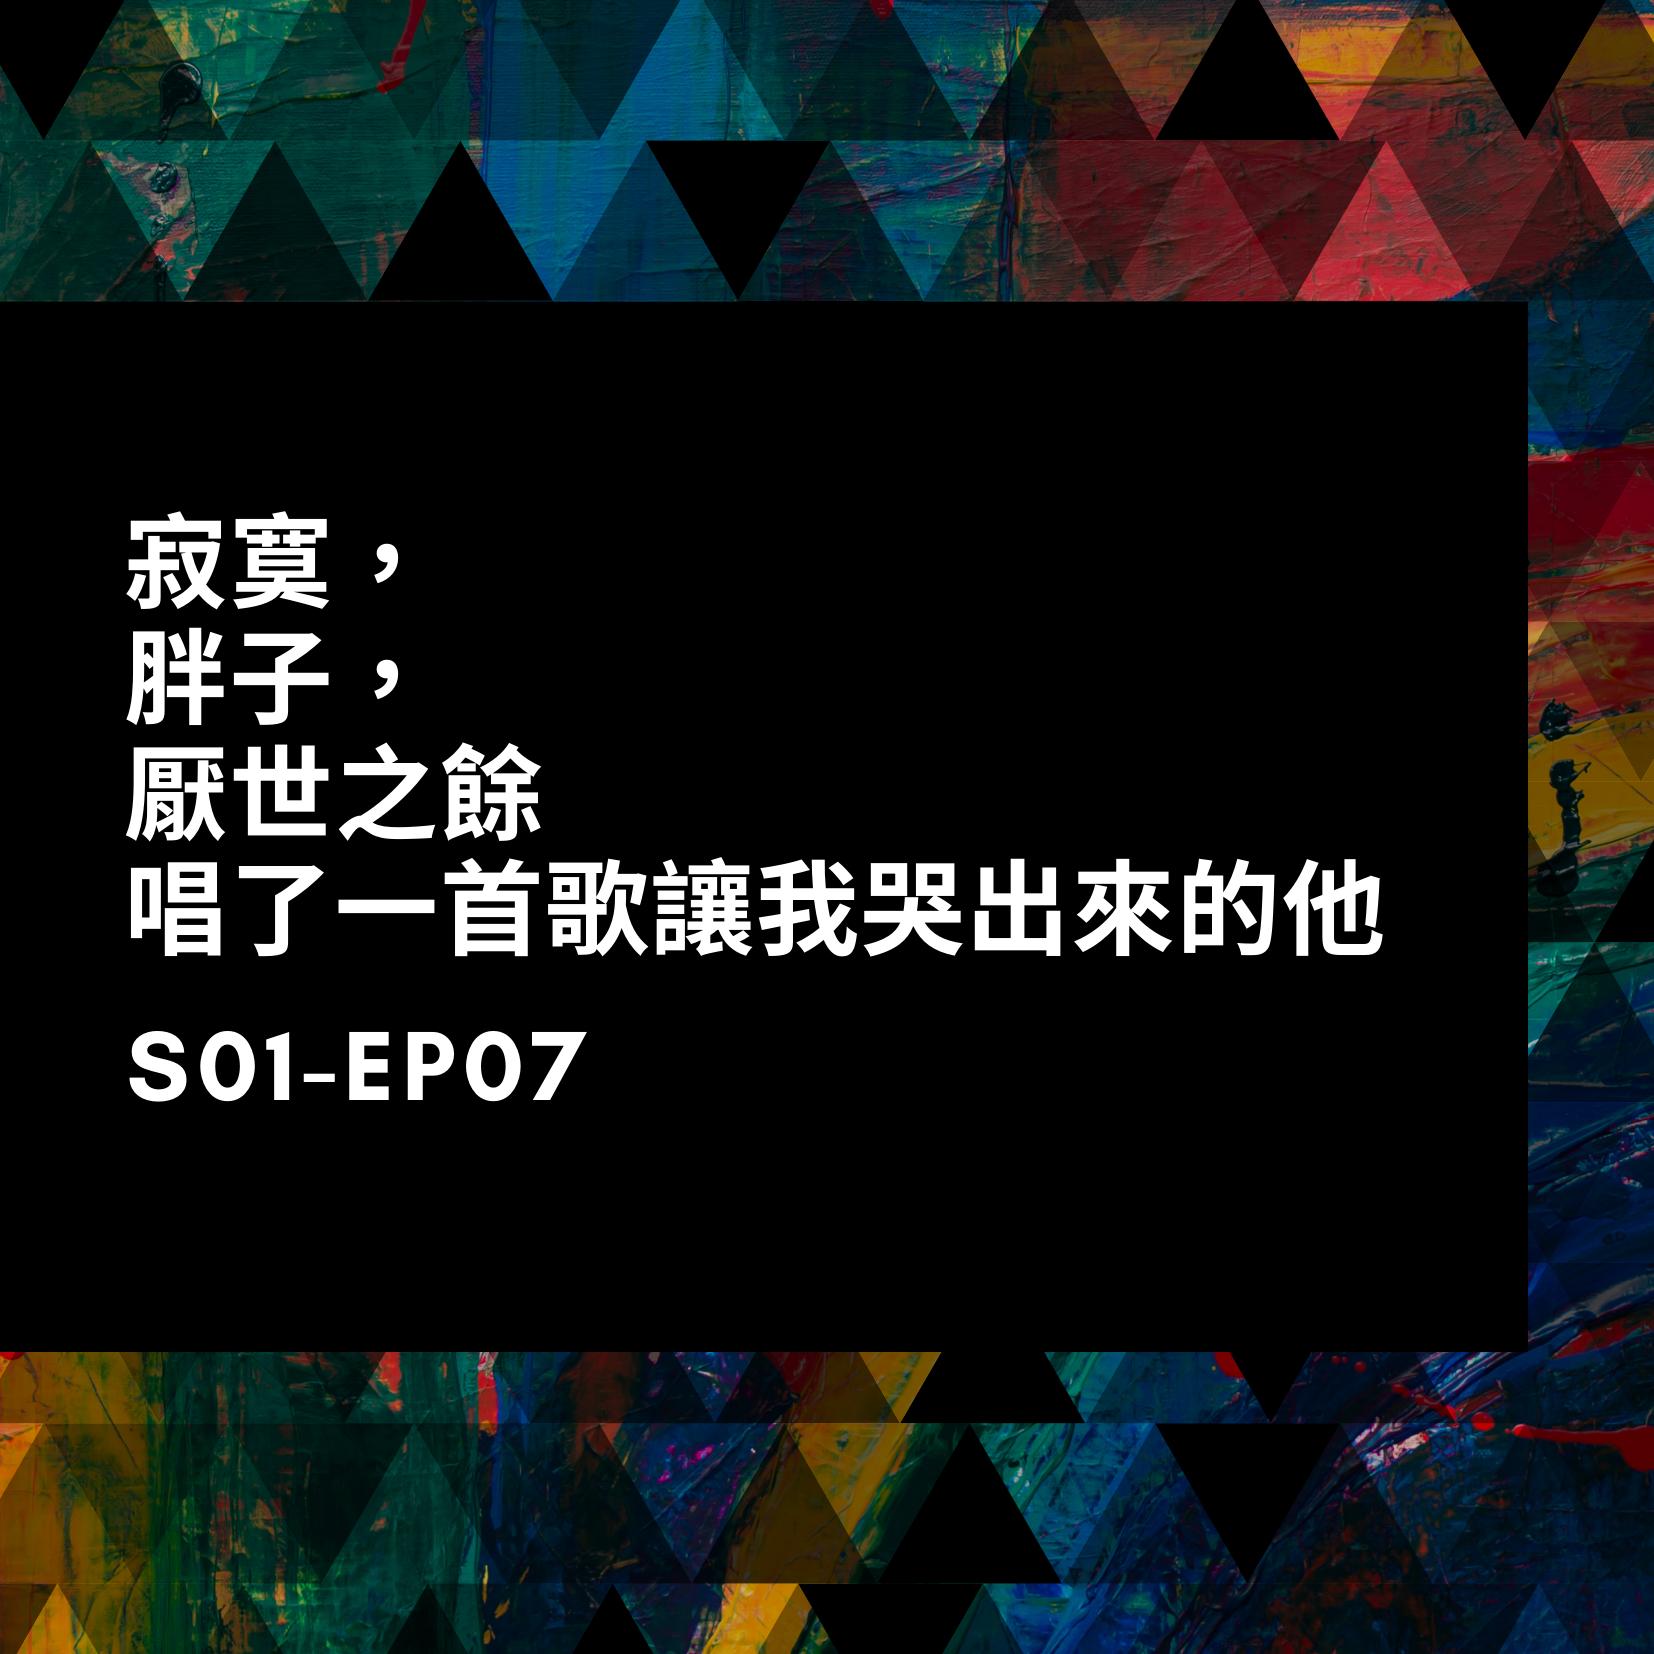 S01-EP07 厭世之餘唱了一首歌讓我哭的他 Feat. 曹策勛 (音量修正)